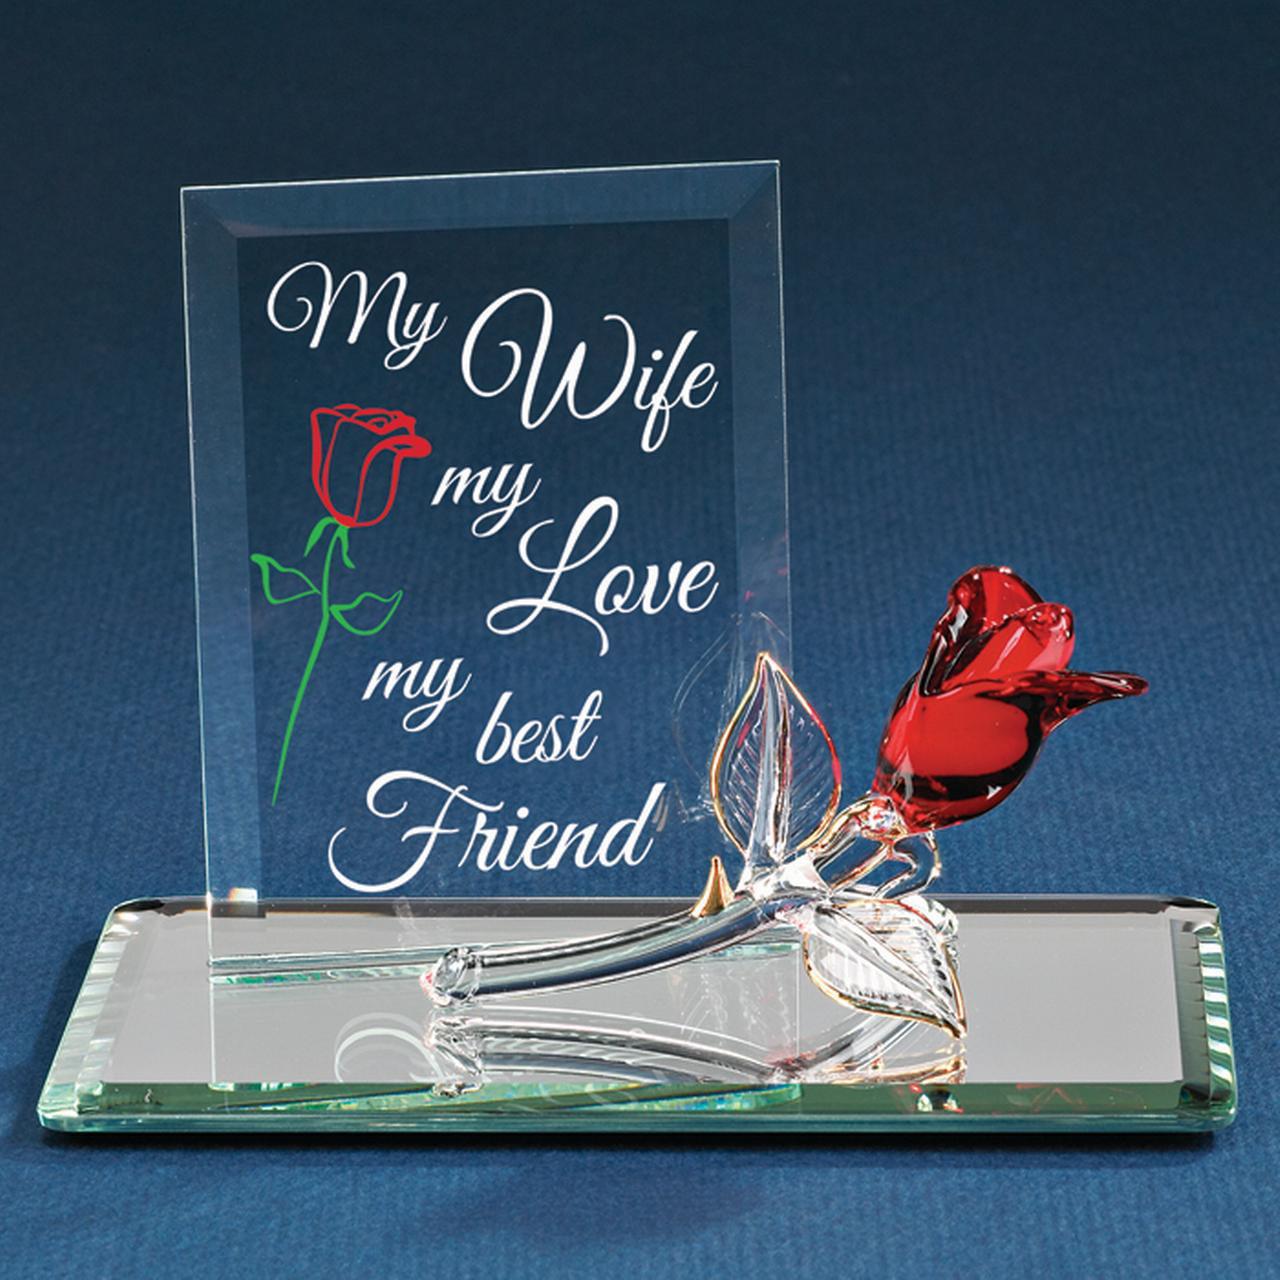 My Wife Best Friends Bestfriend Friendship Red Rose Glass Figurine Glas Baron Love For Women